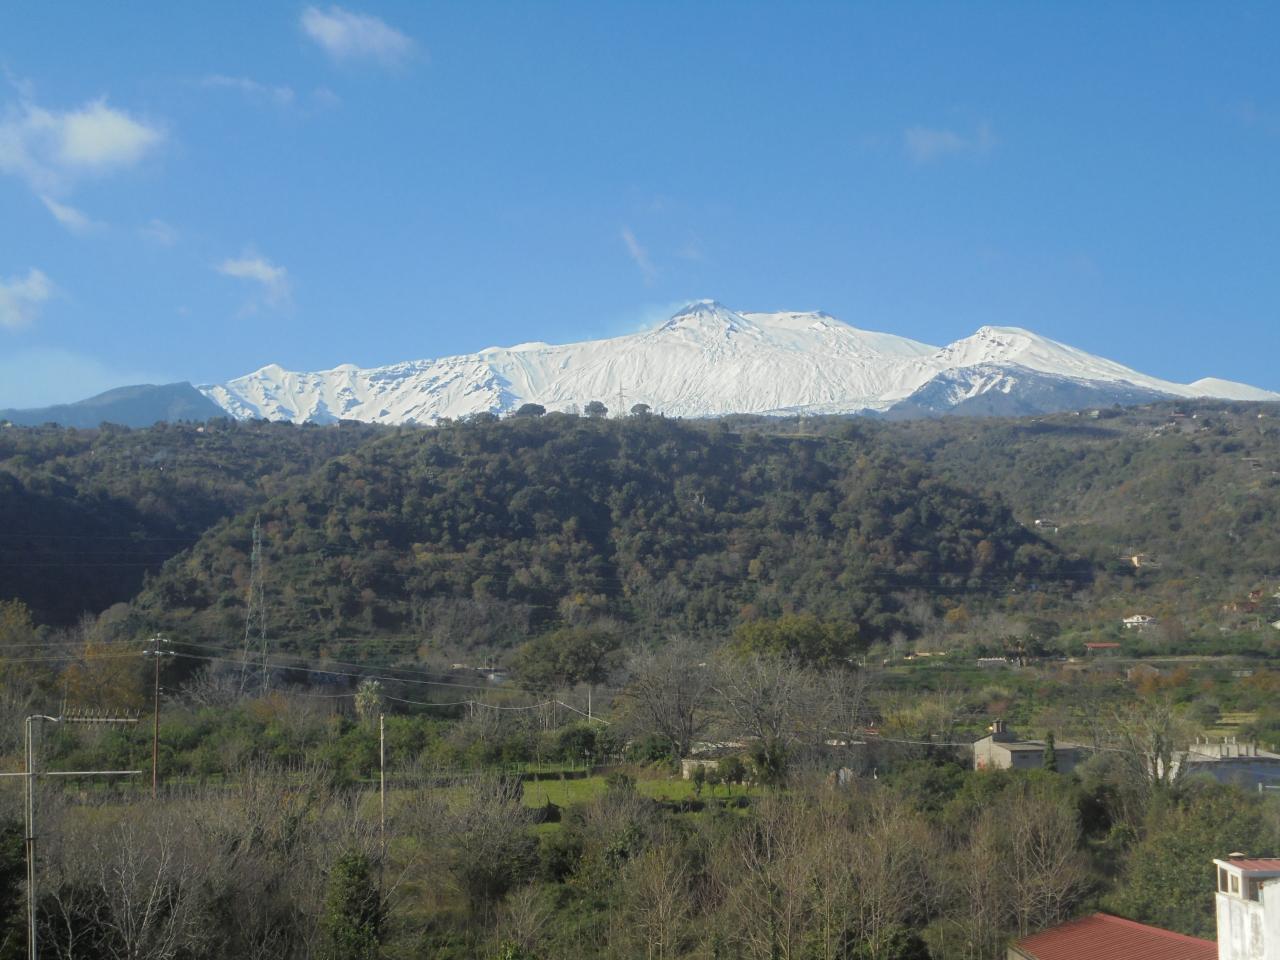 Appartement de vacances MARE - ETNA - TAORMINA (2618228), Mascali, Catania, Sicile, Italie, image 28